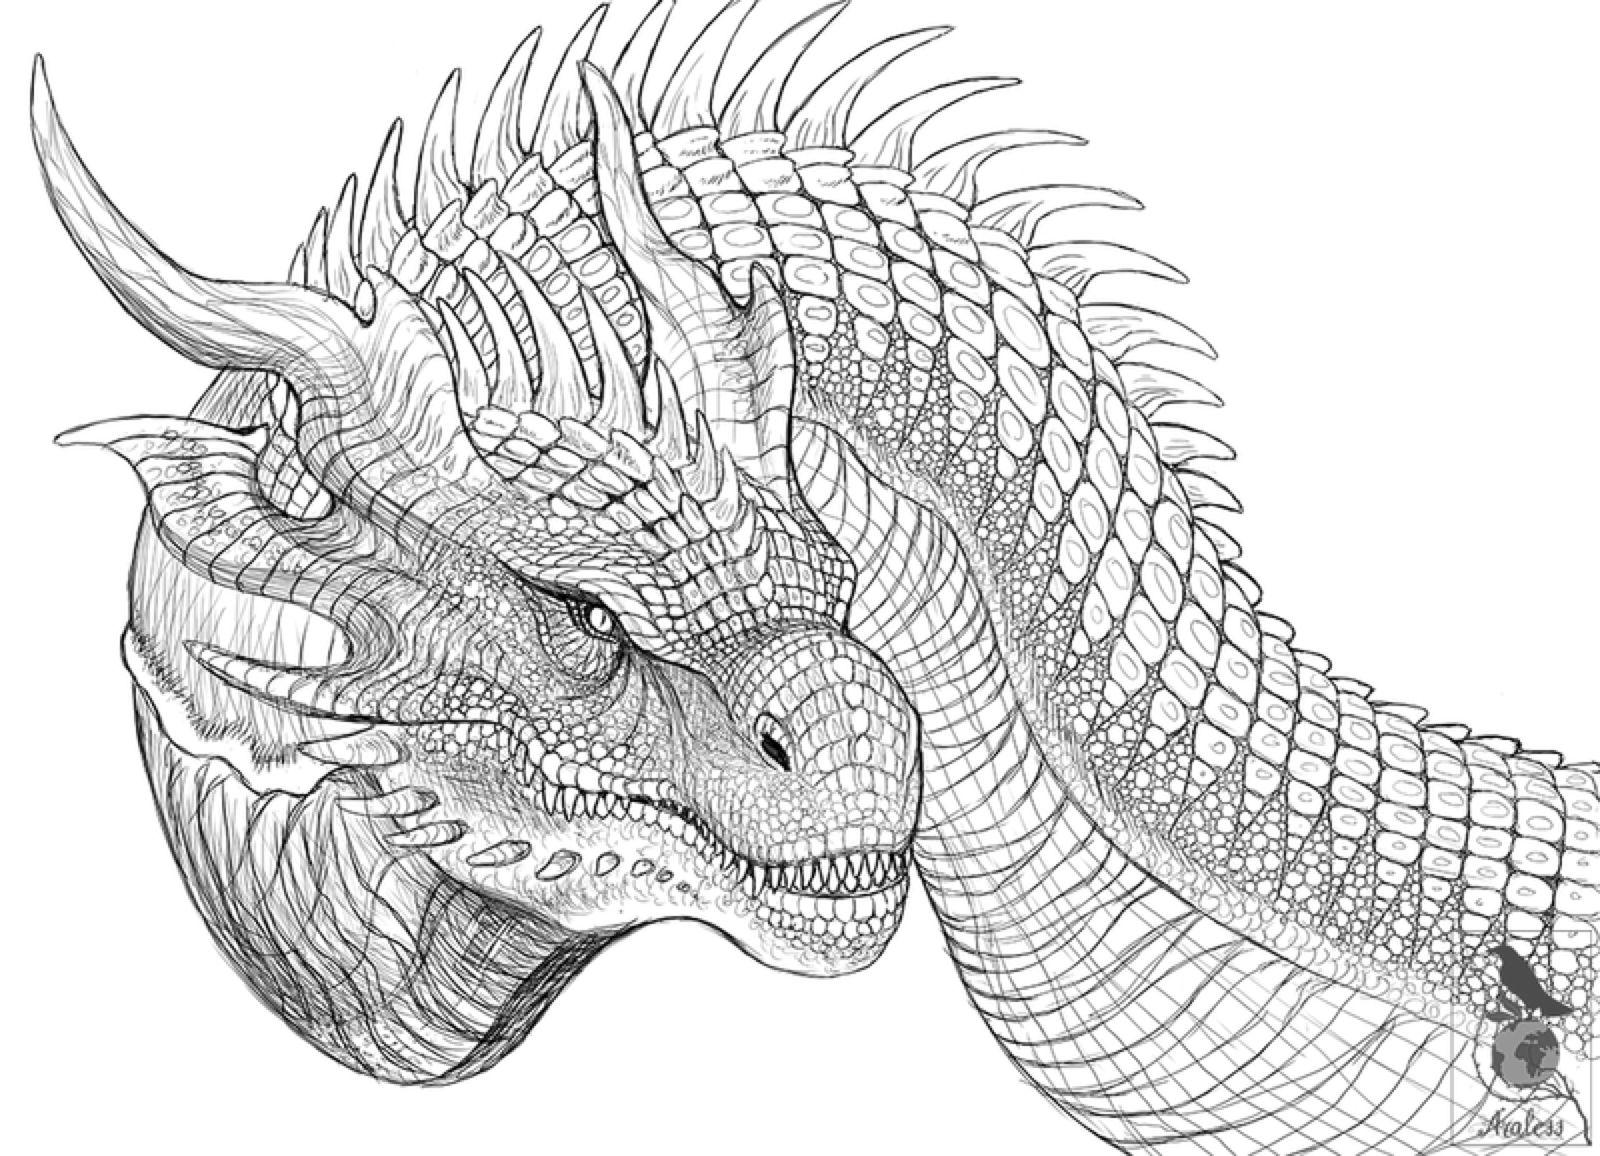 Iron Dragon Sketch By Araless On Deviantart Dragon Sketch